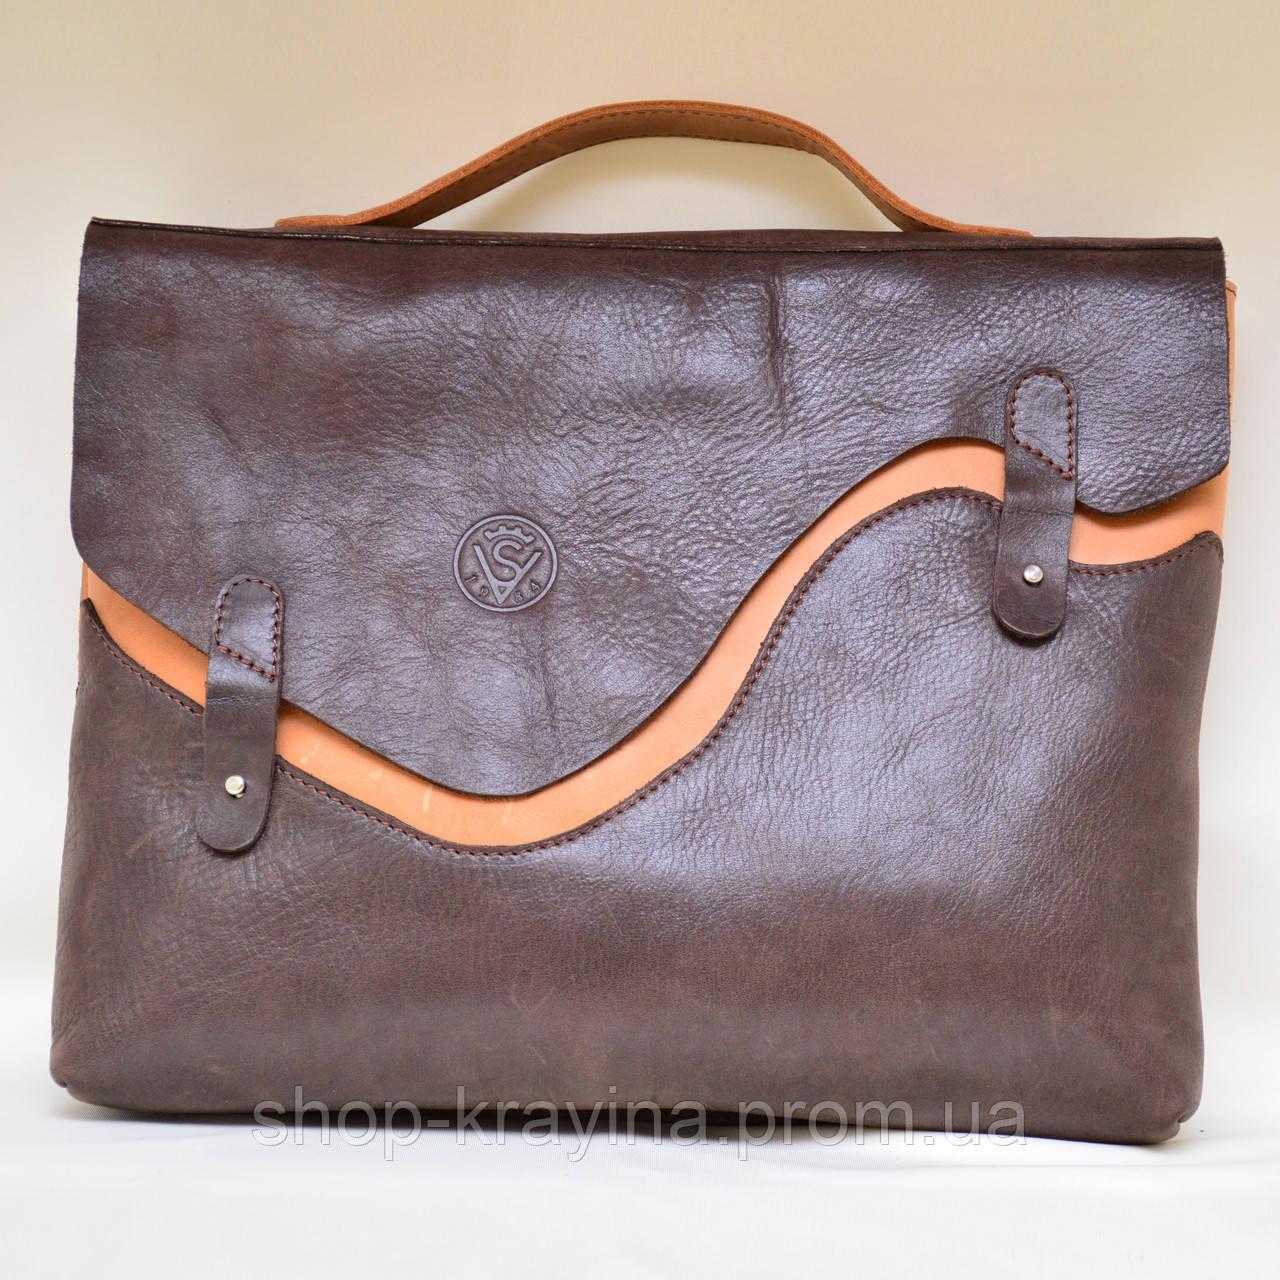 Портфель для документов VS130 orange in chocolate 32х26х5 см